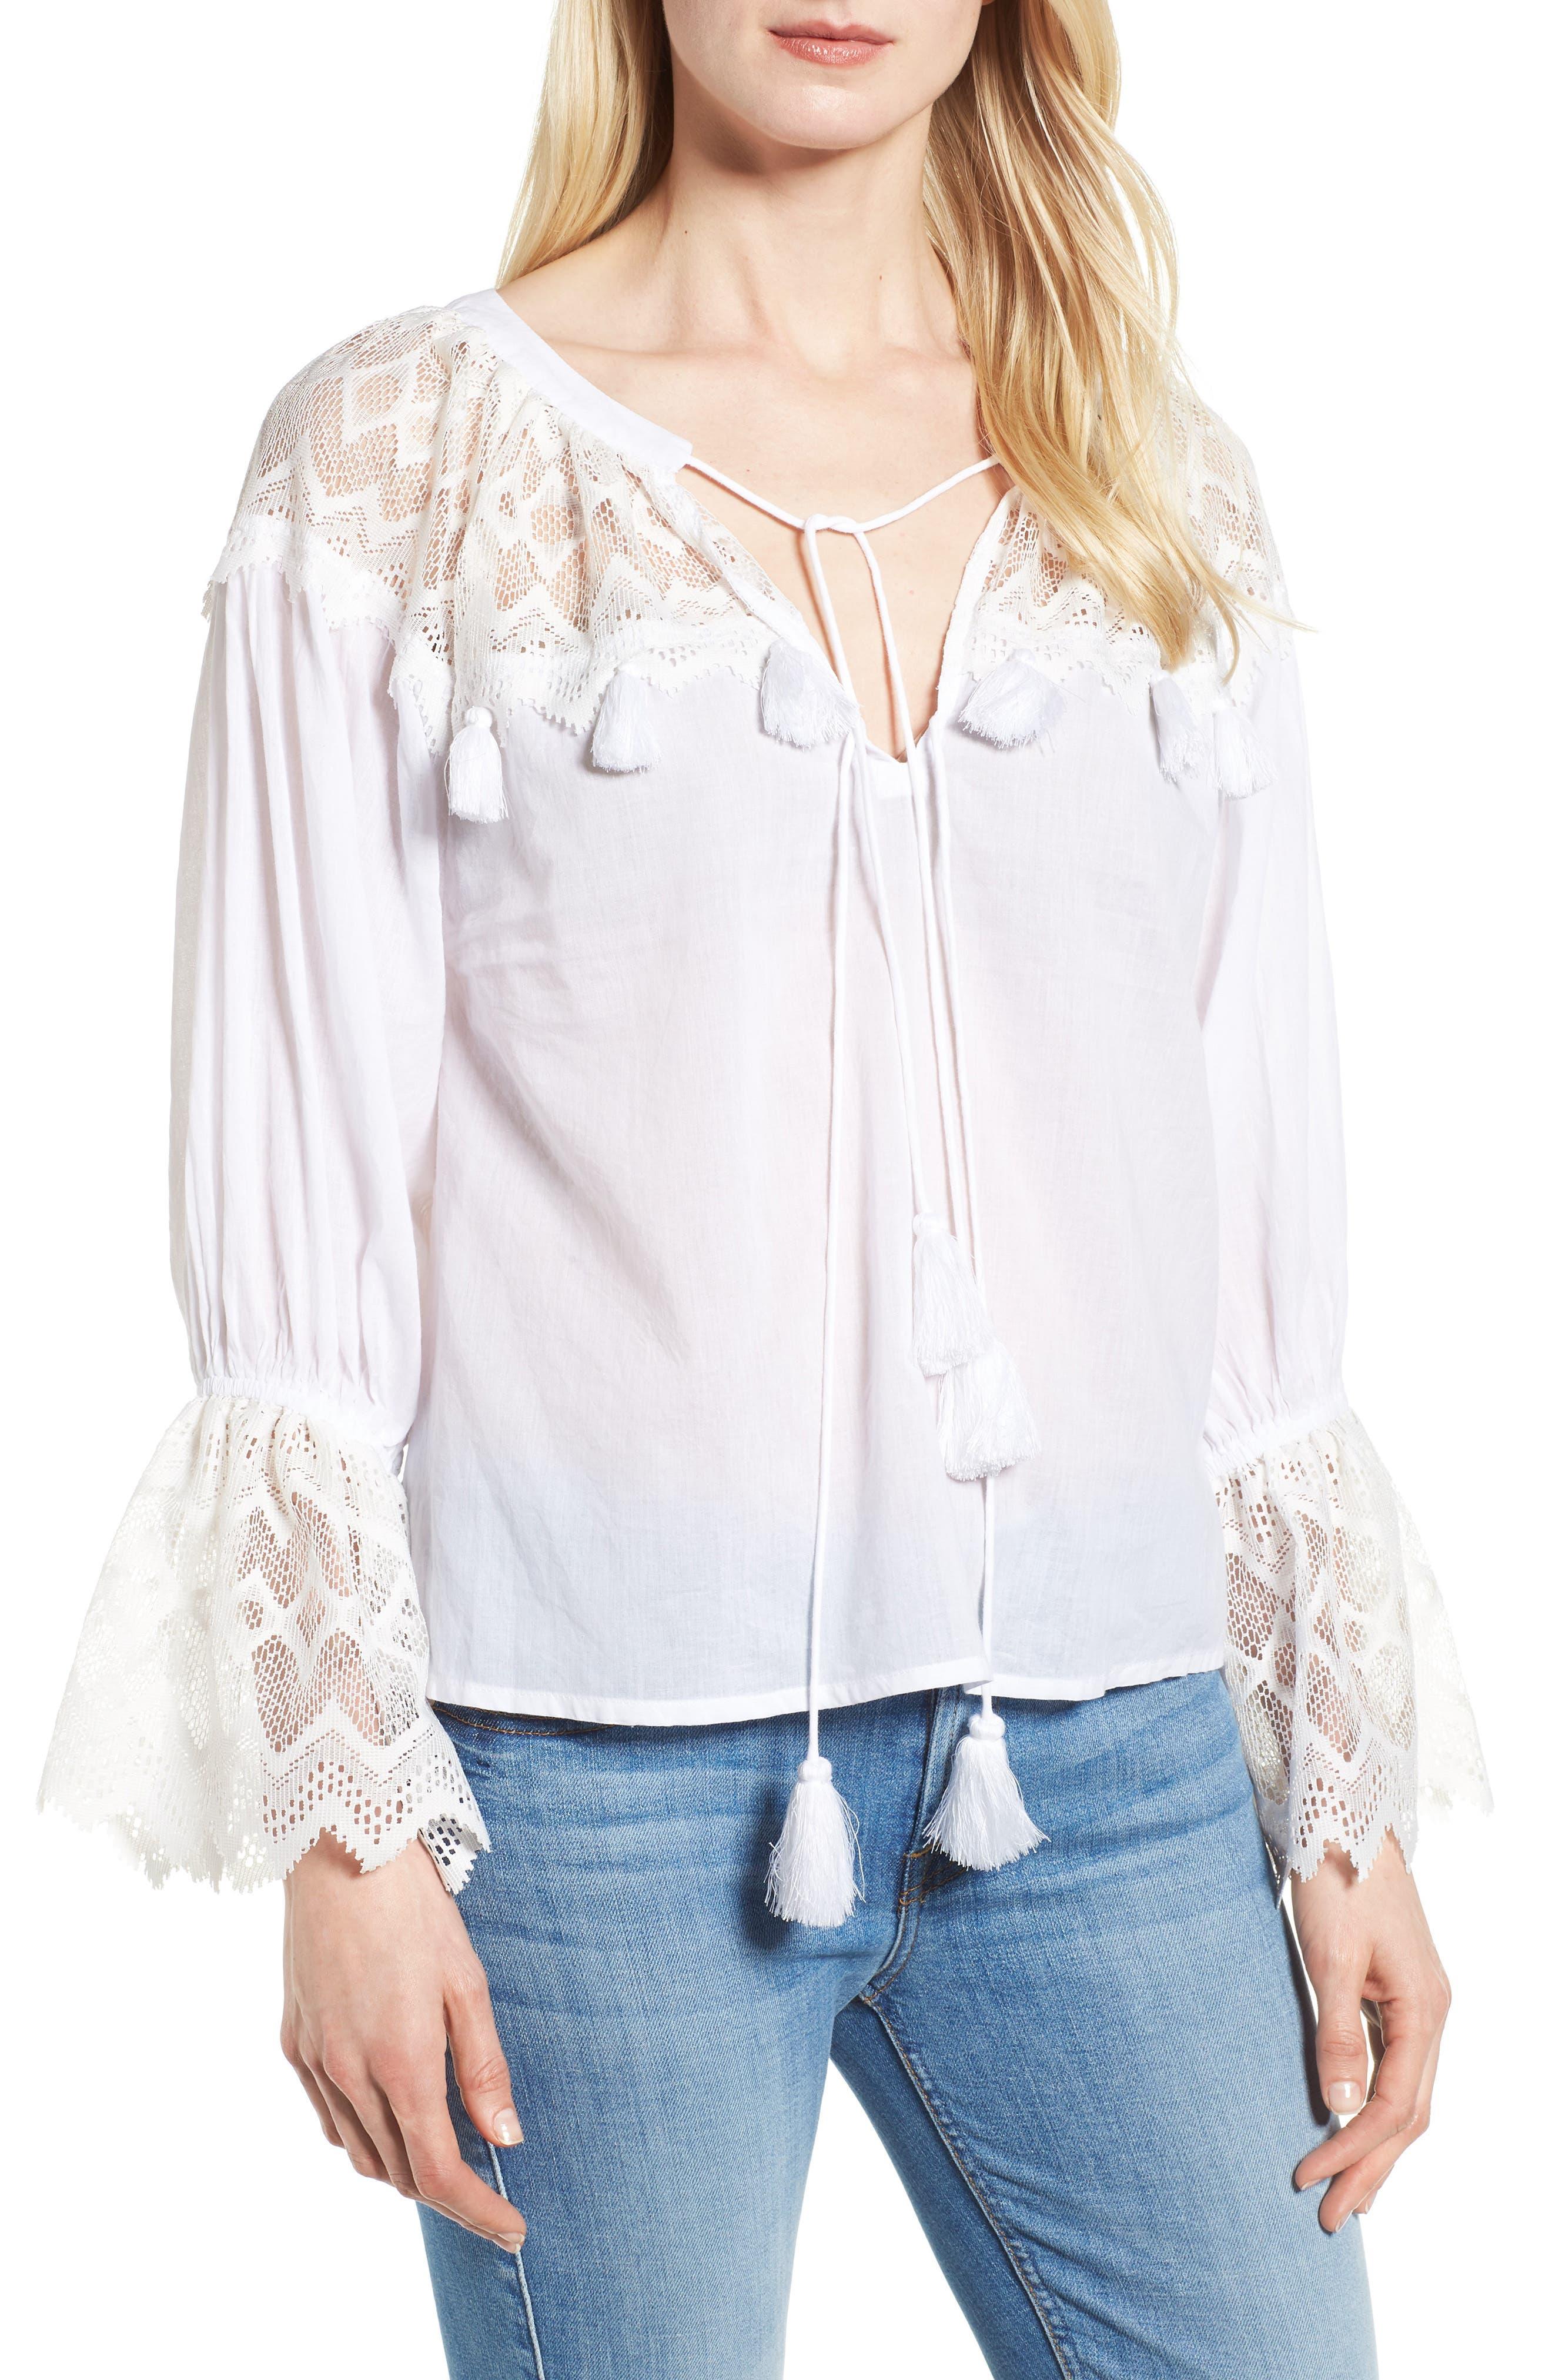 Main Image - KAS NEW YORK Berkley White Lace Cotton Blend Top